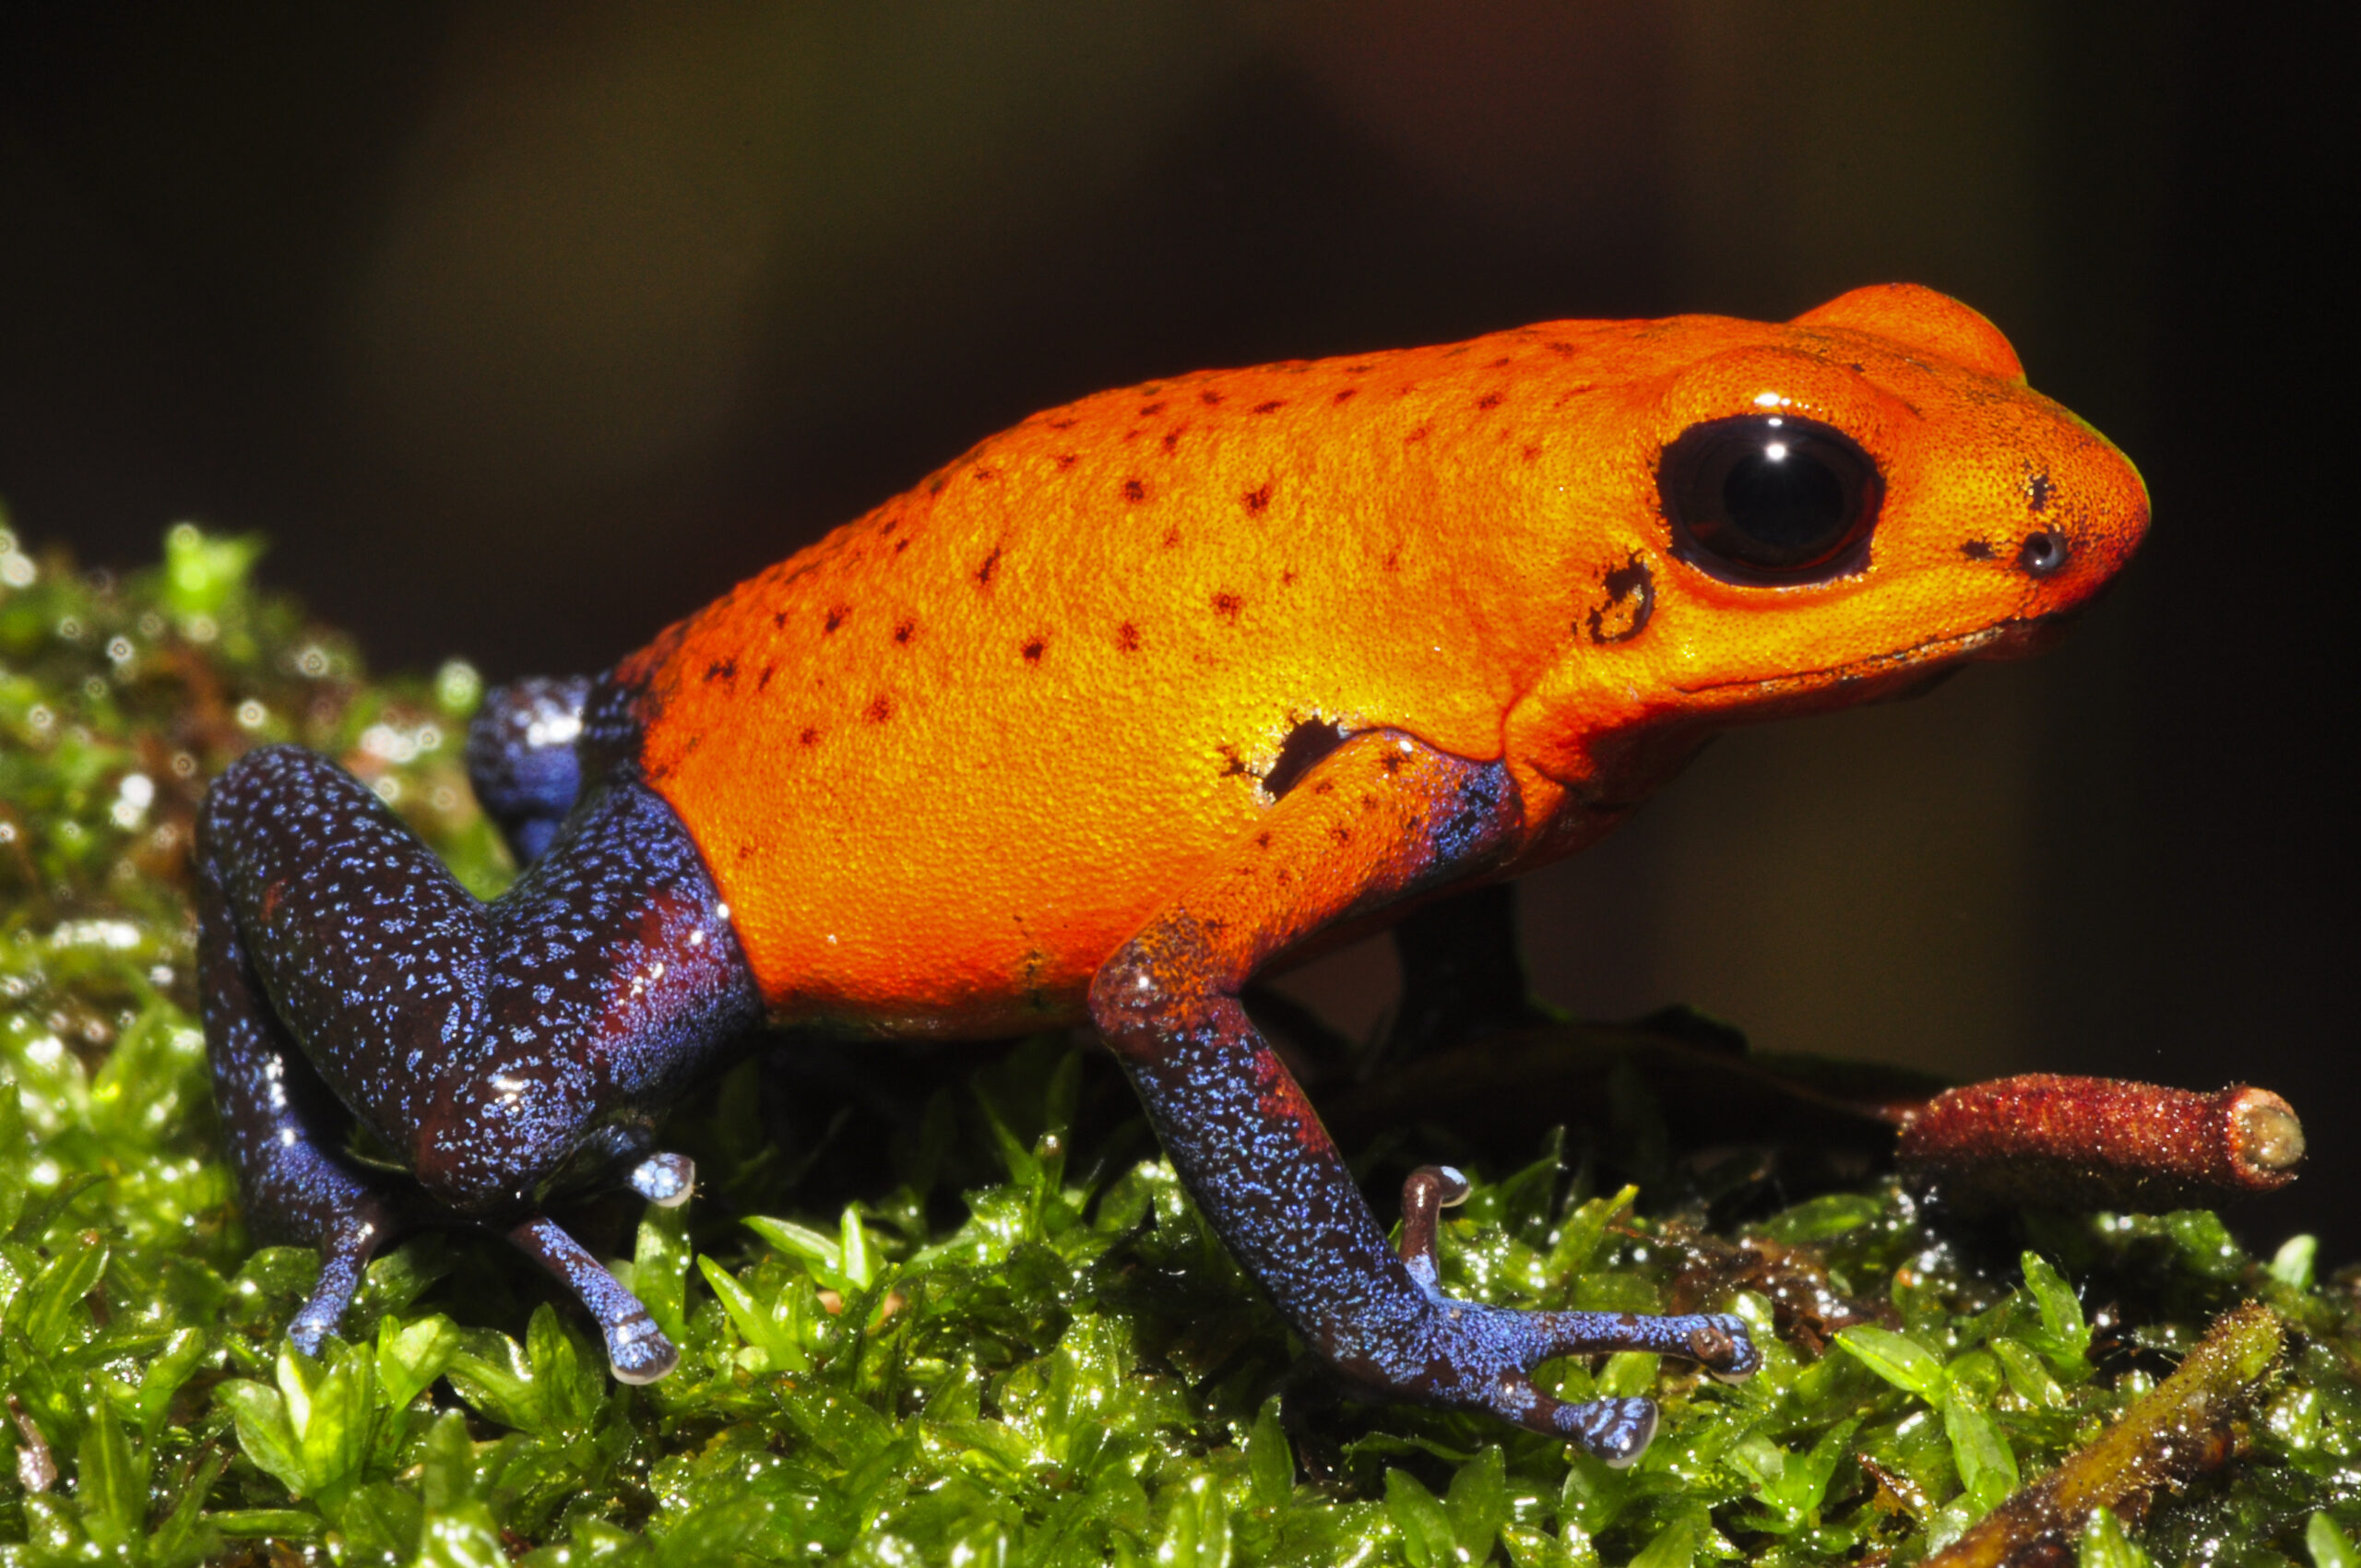 Oophaga pumilio from Heridia, Costa Rica - by J. Van der Meulen.